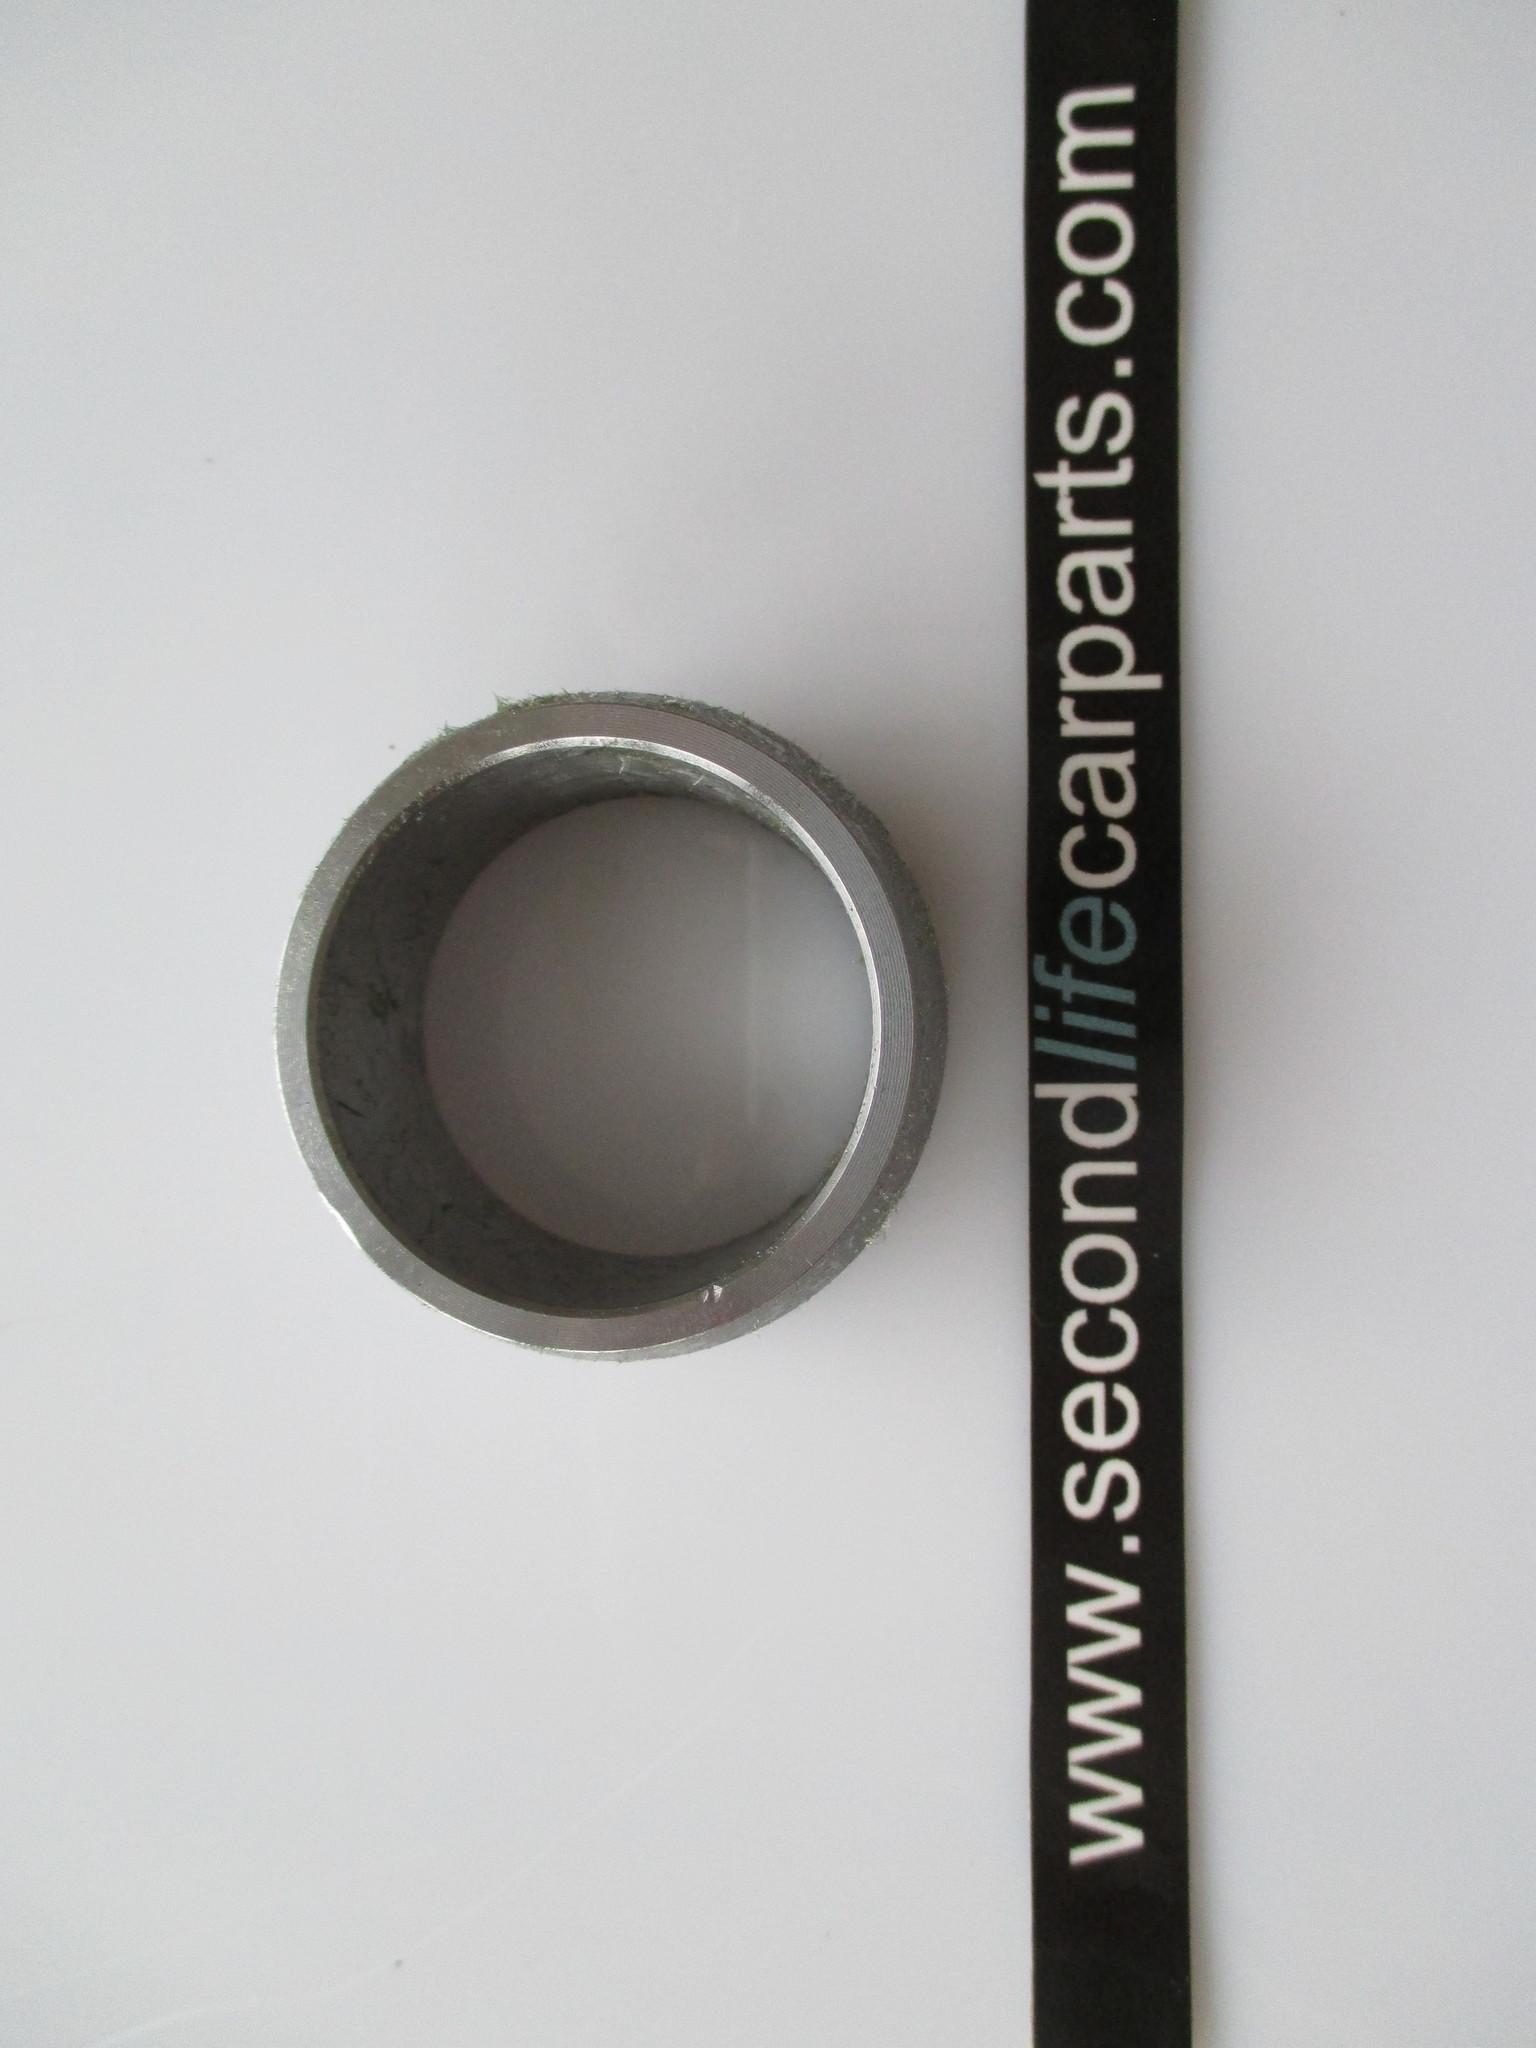 90217398  Halfshaft Collar Front All Series